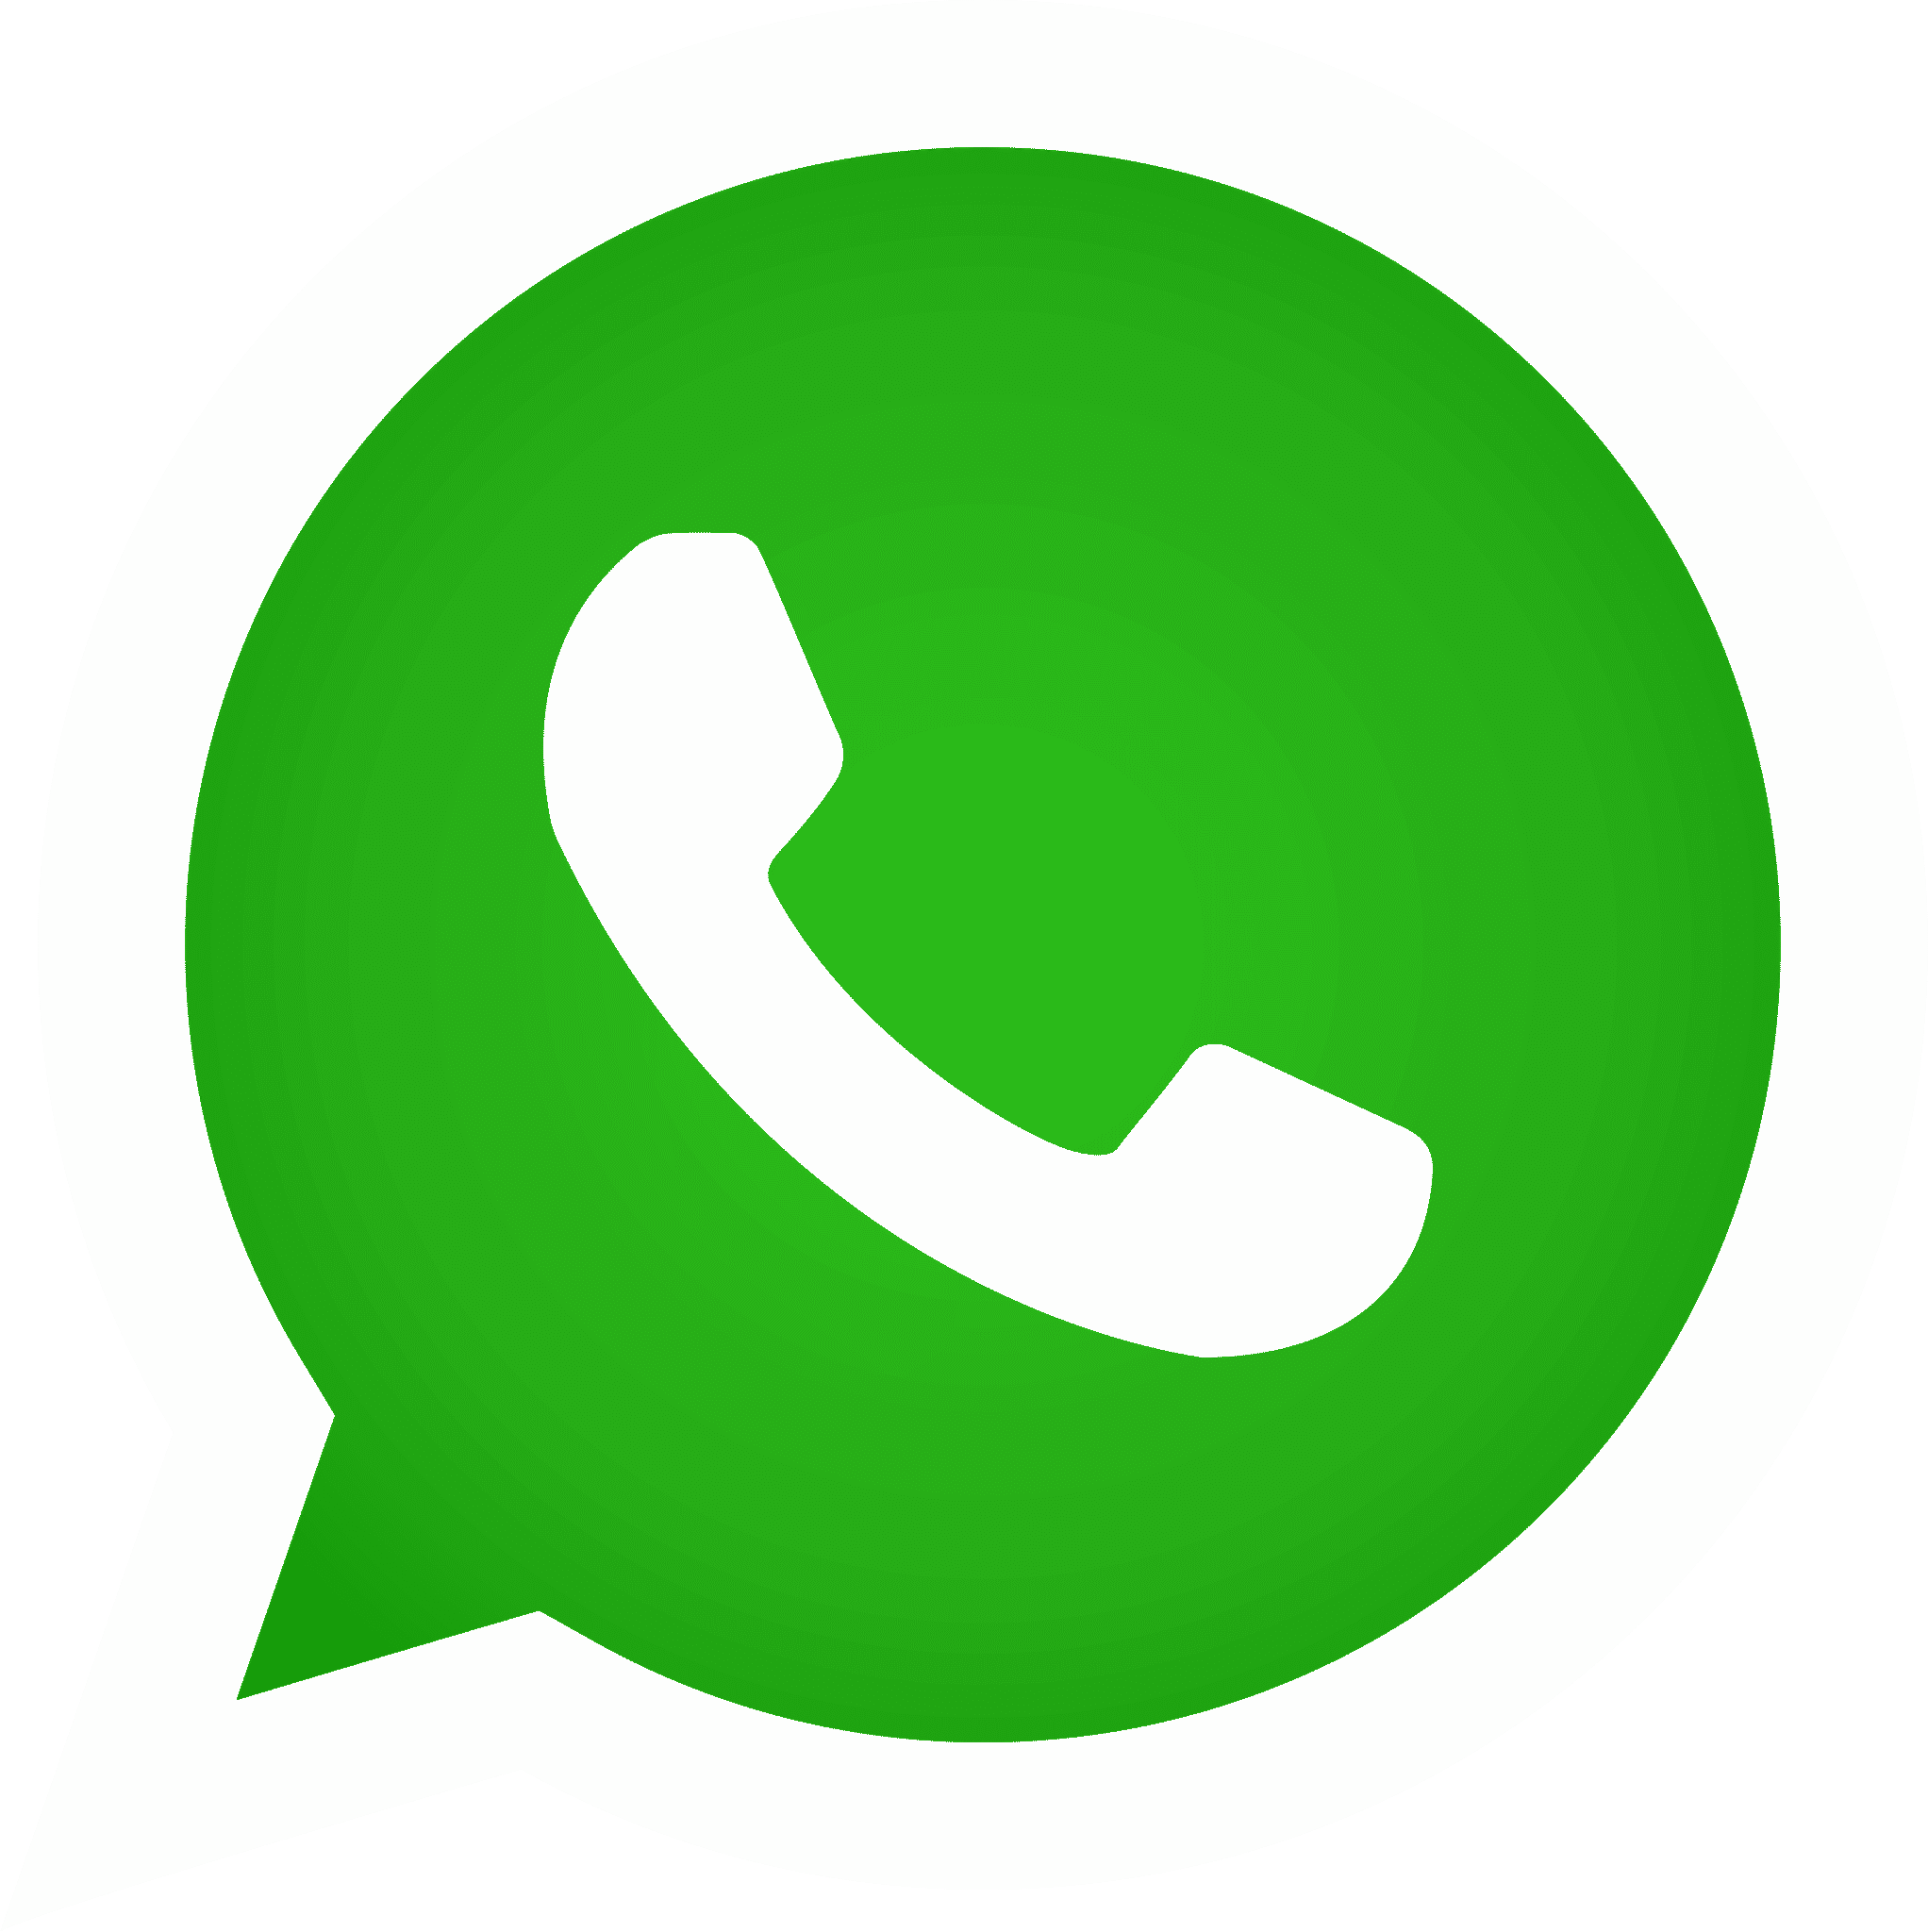 Связаться с нами по Whatsapp